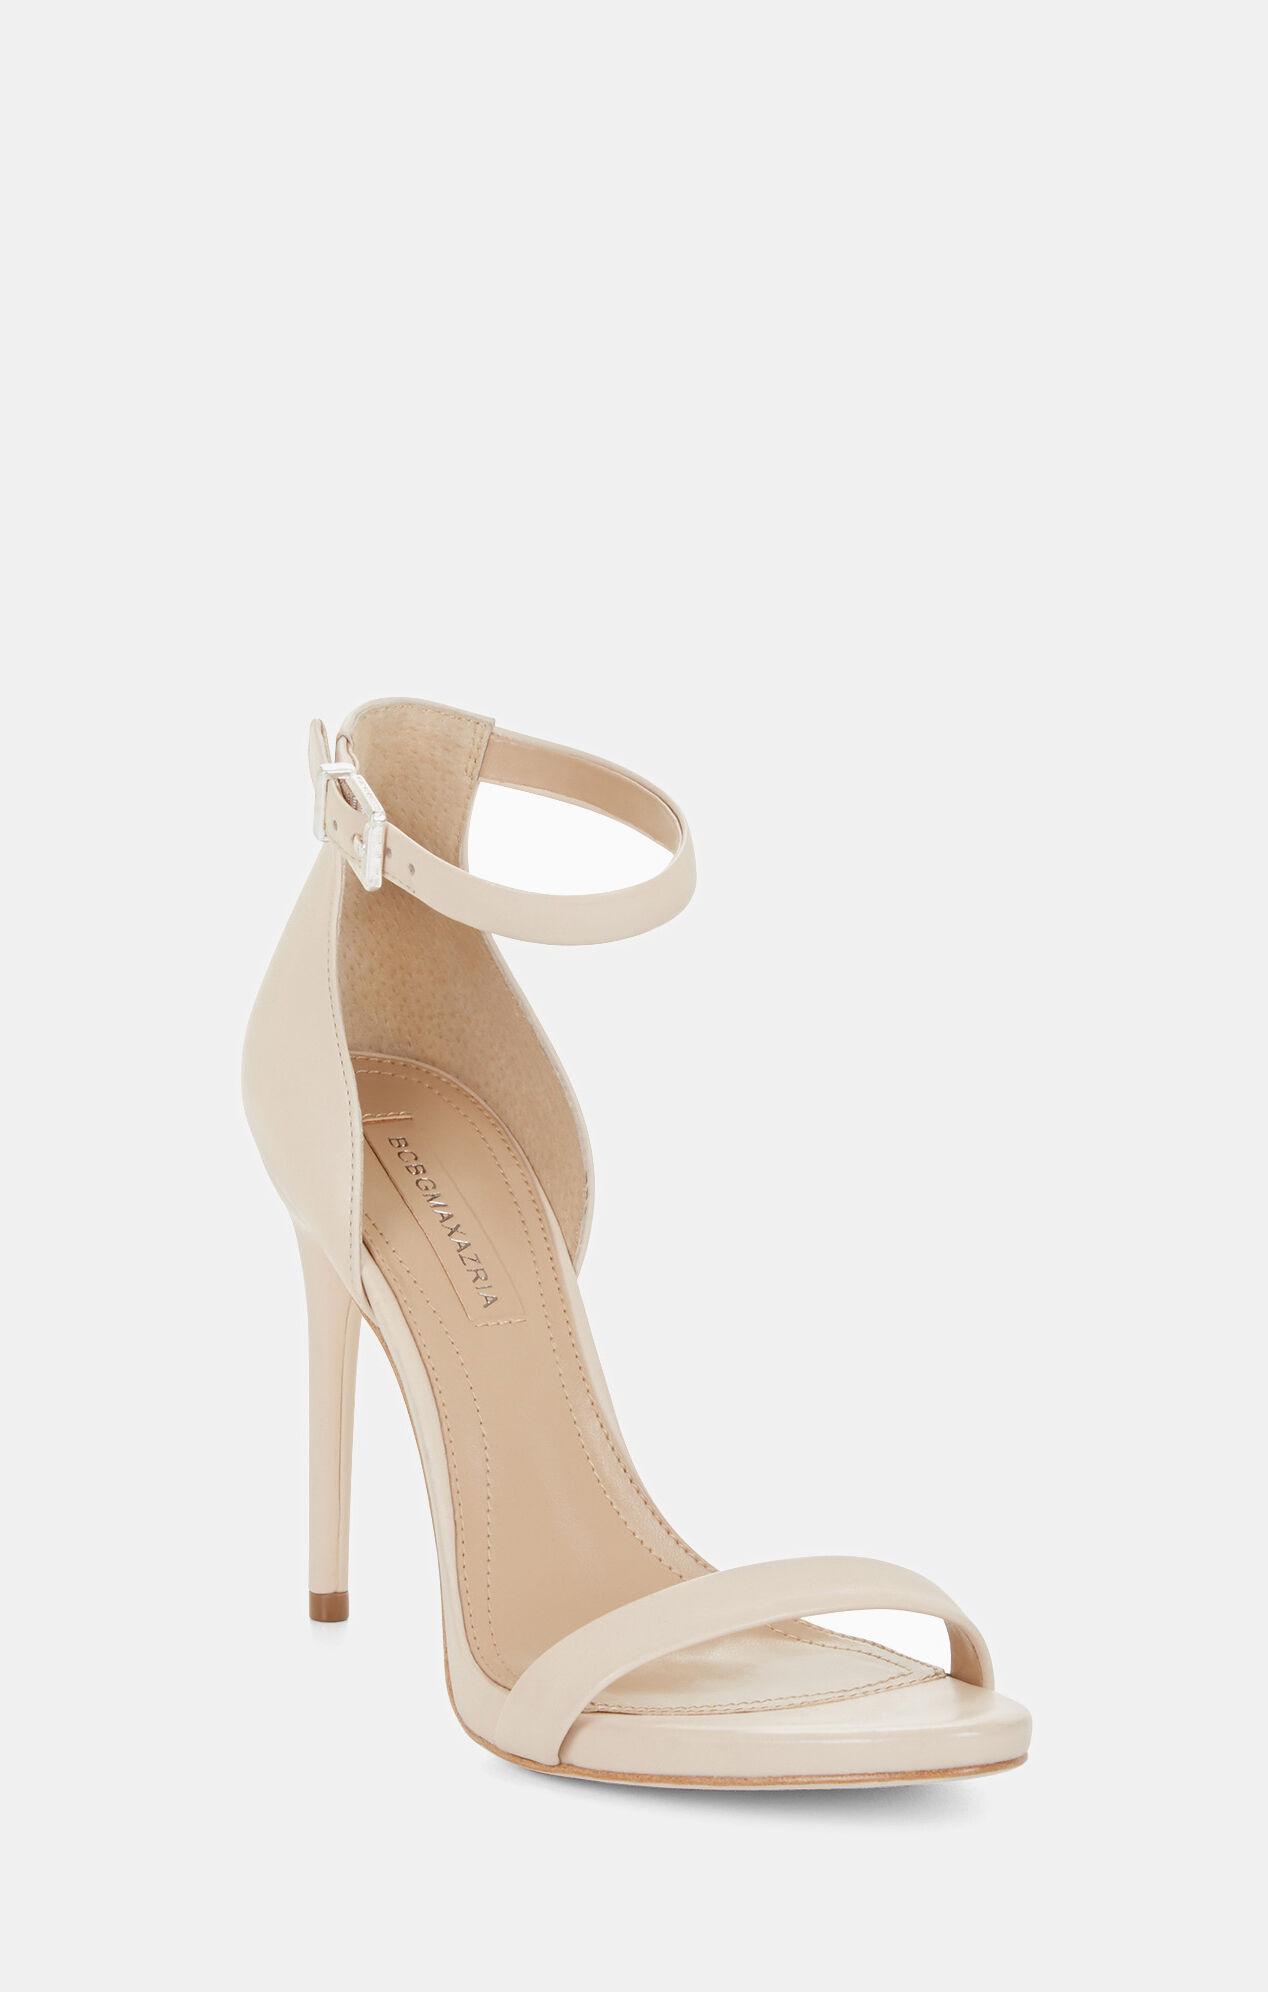 Dona High-Heel Leather Sandal